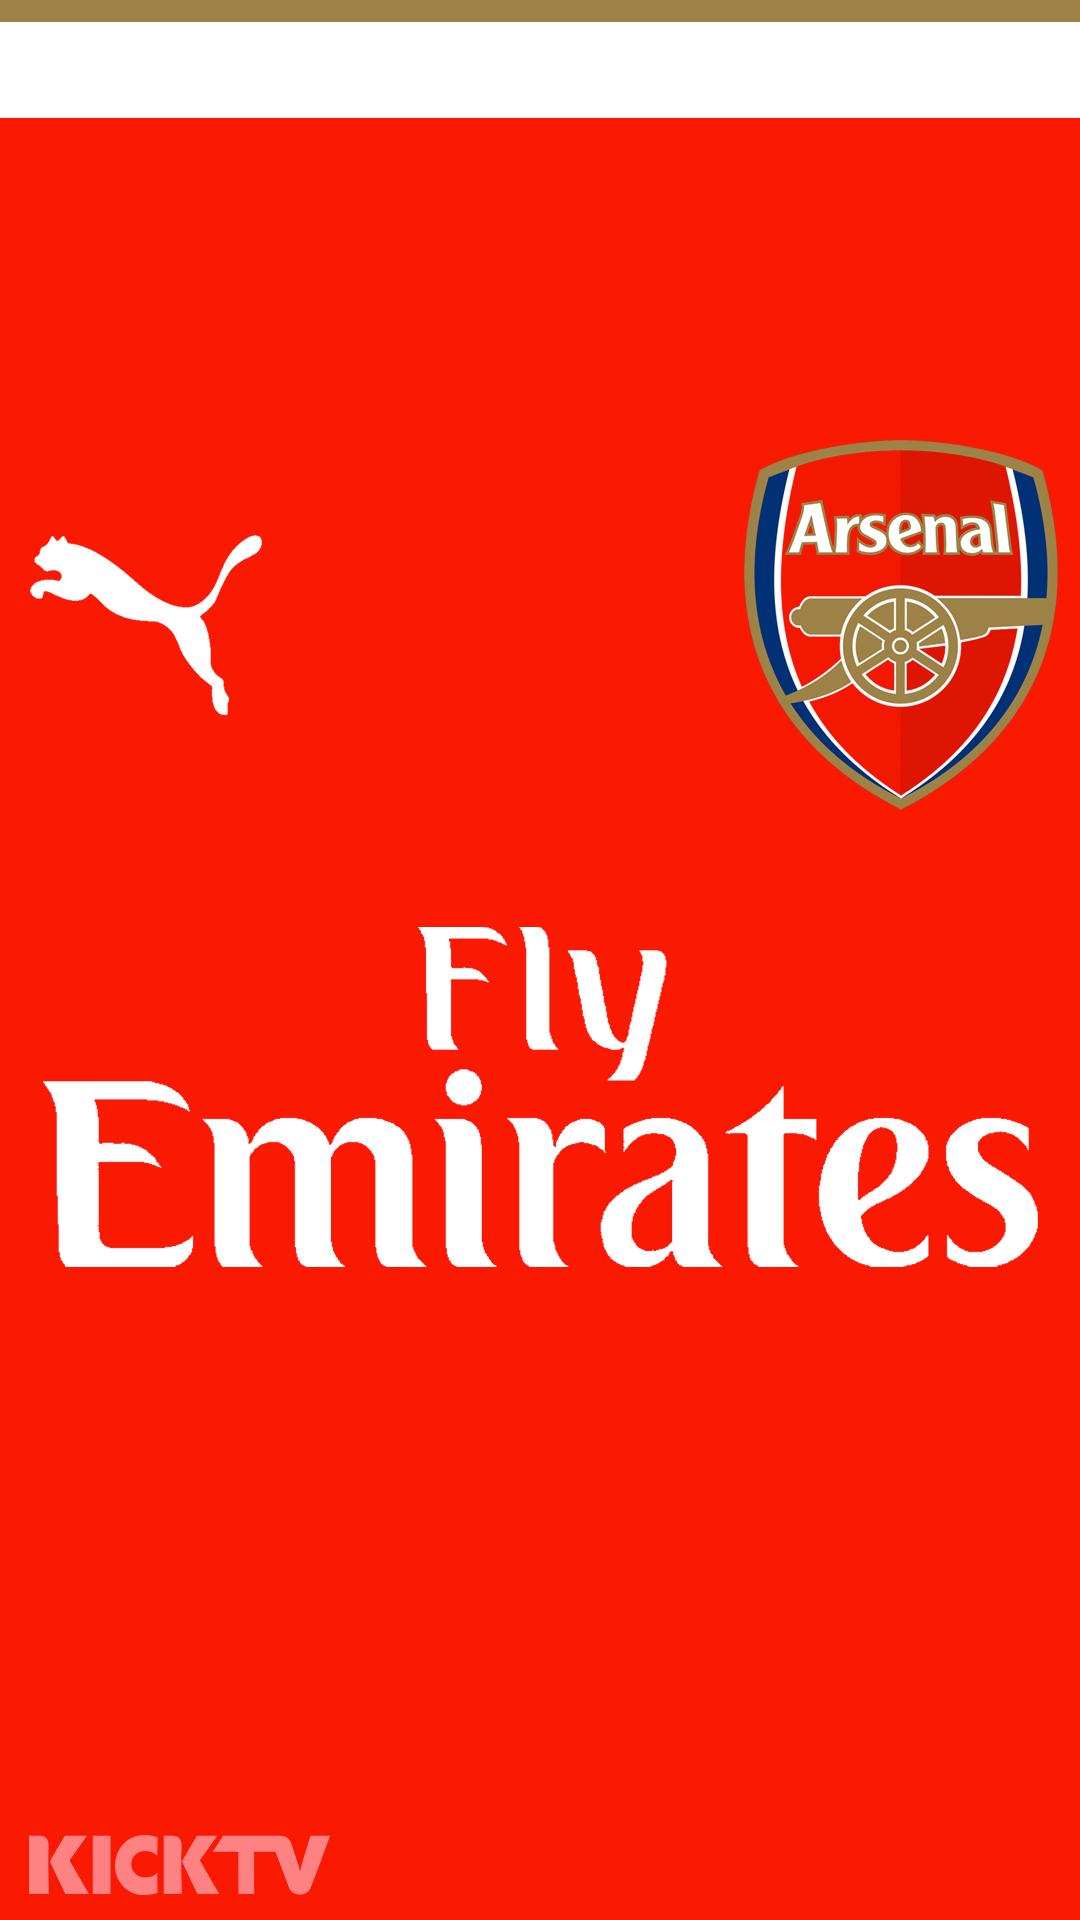 Wallpaper iphone arsenal - 2015 16 Arsenal Jersey Wallpapers On Behance